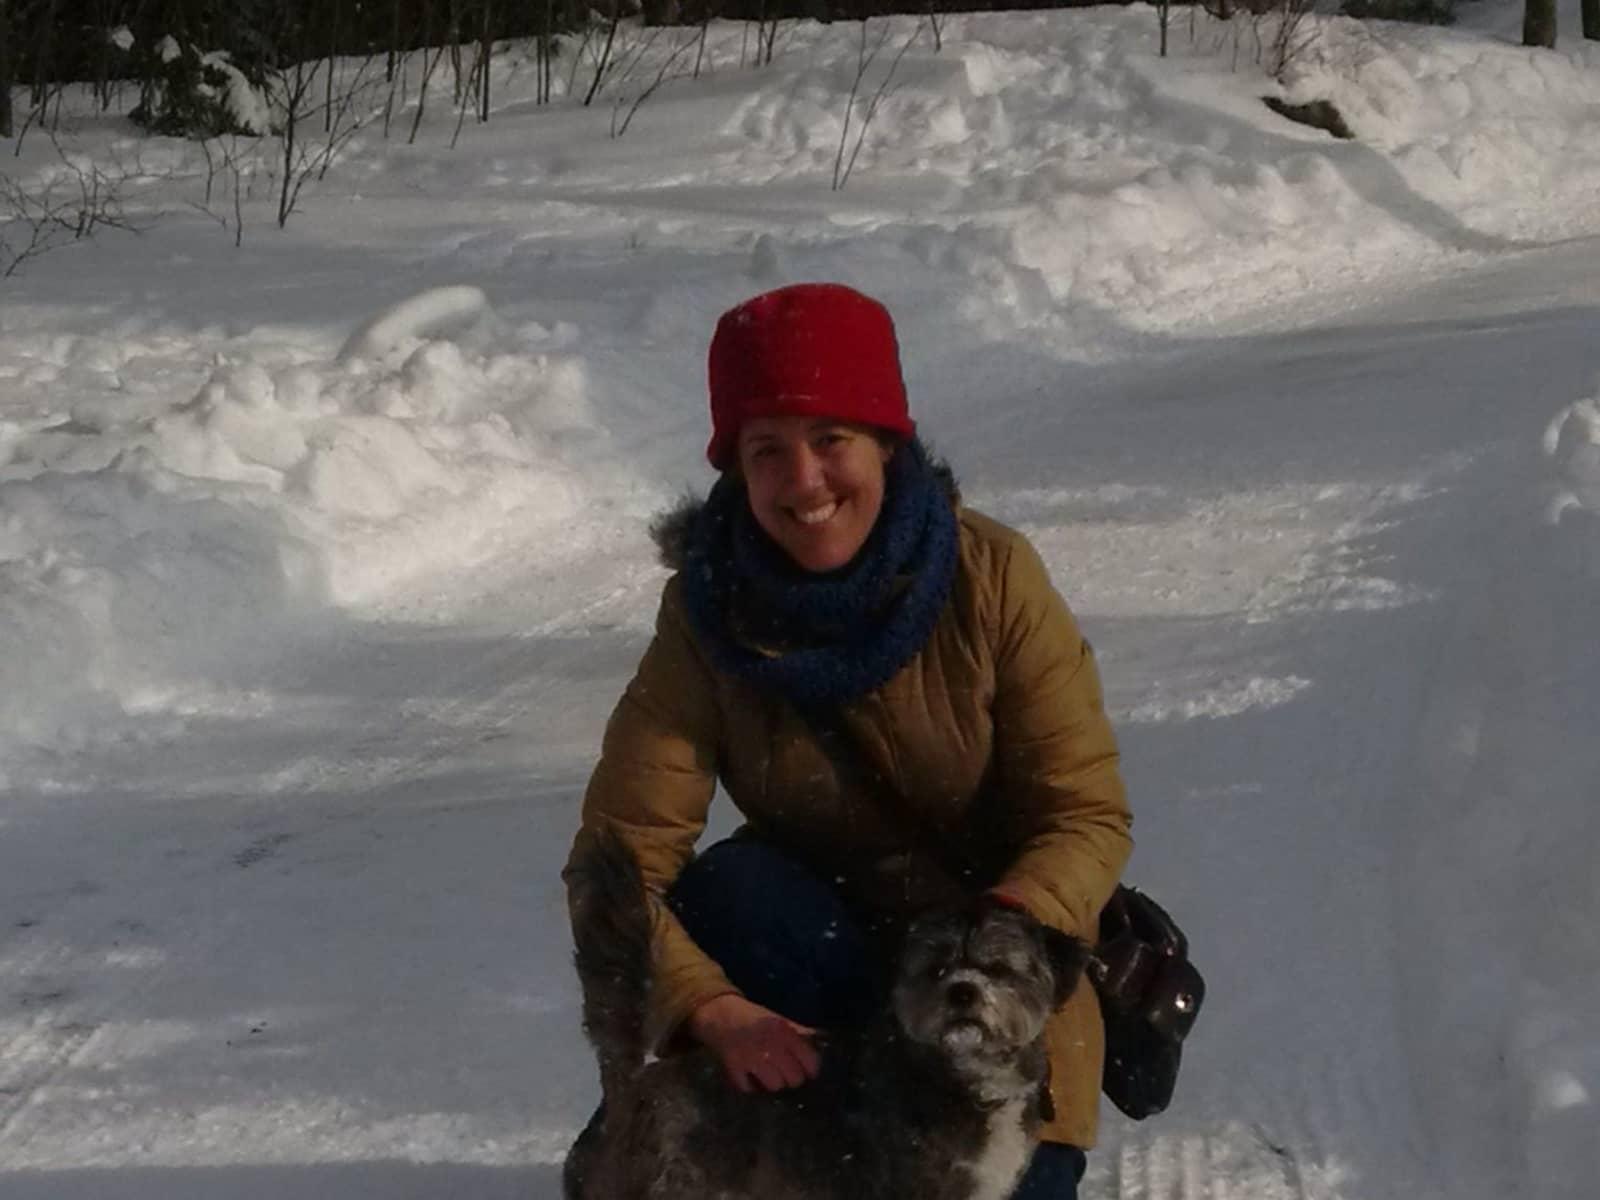 Margaret from Halifax, Nova Scotia, Canada